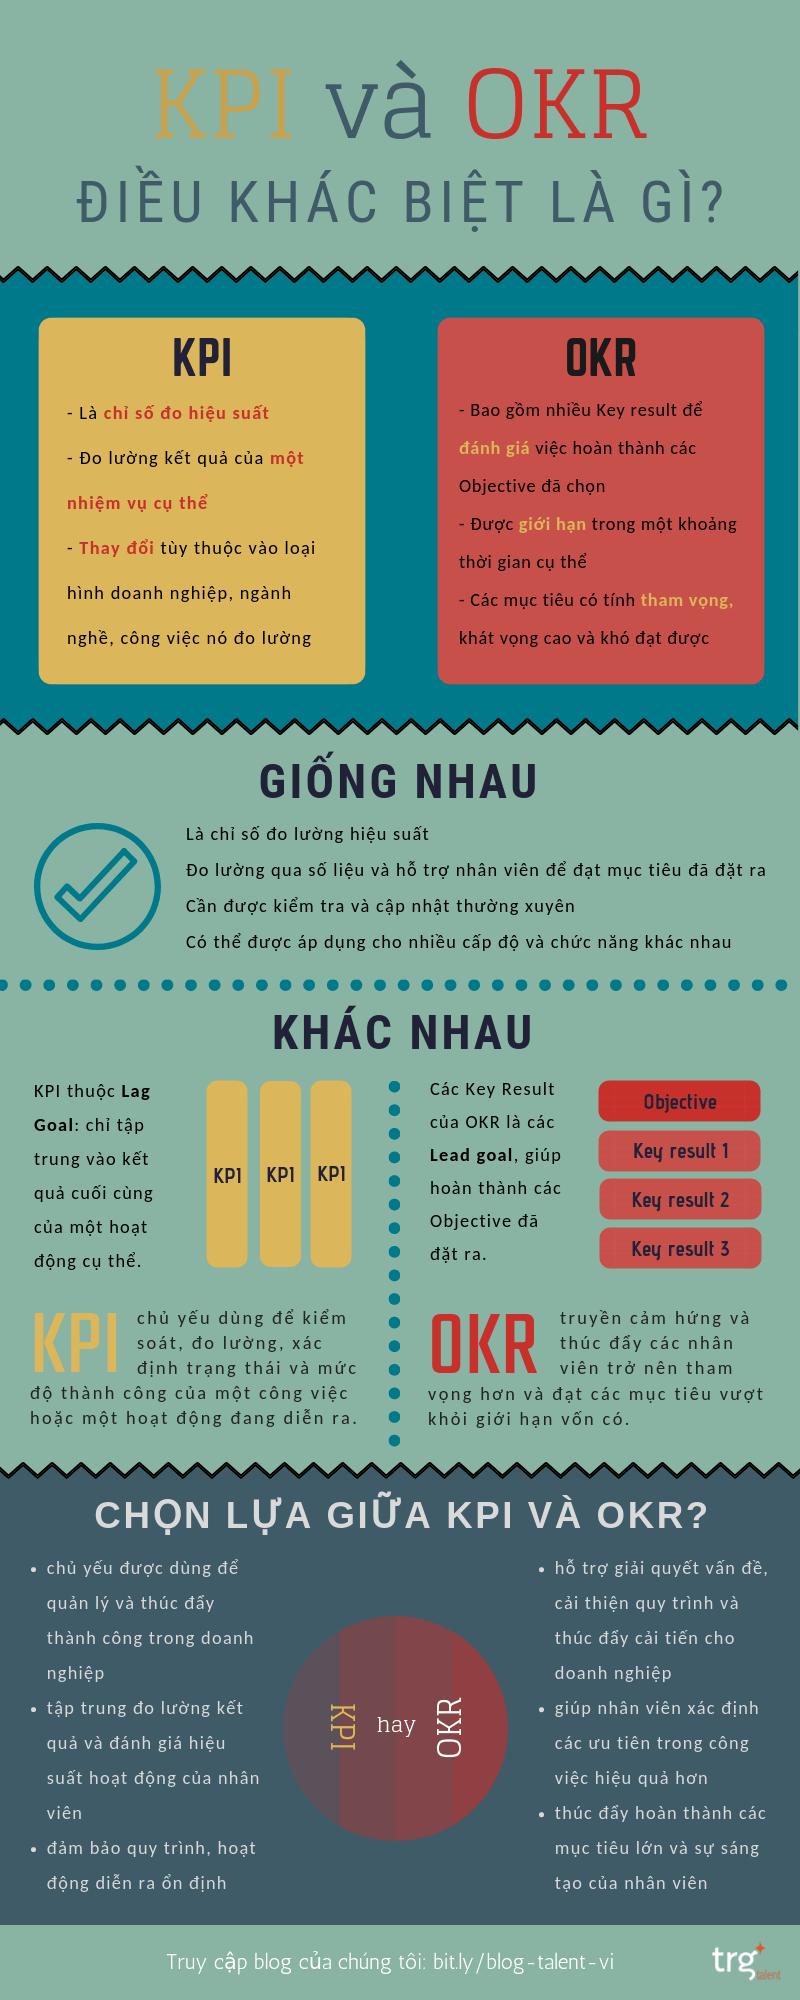 VN - KPIs vs OKRs